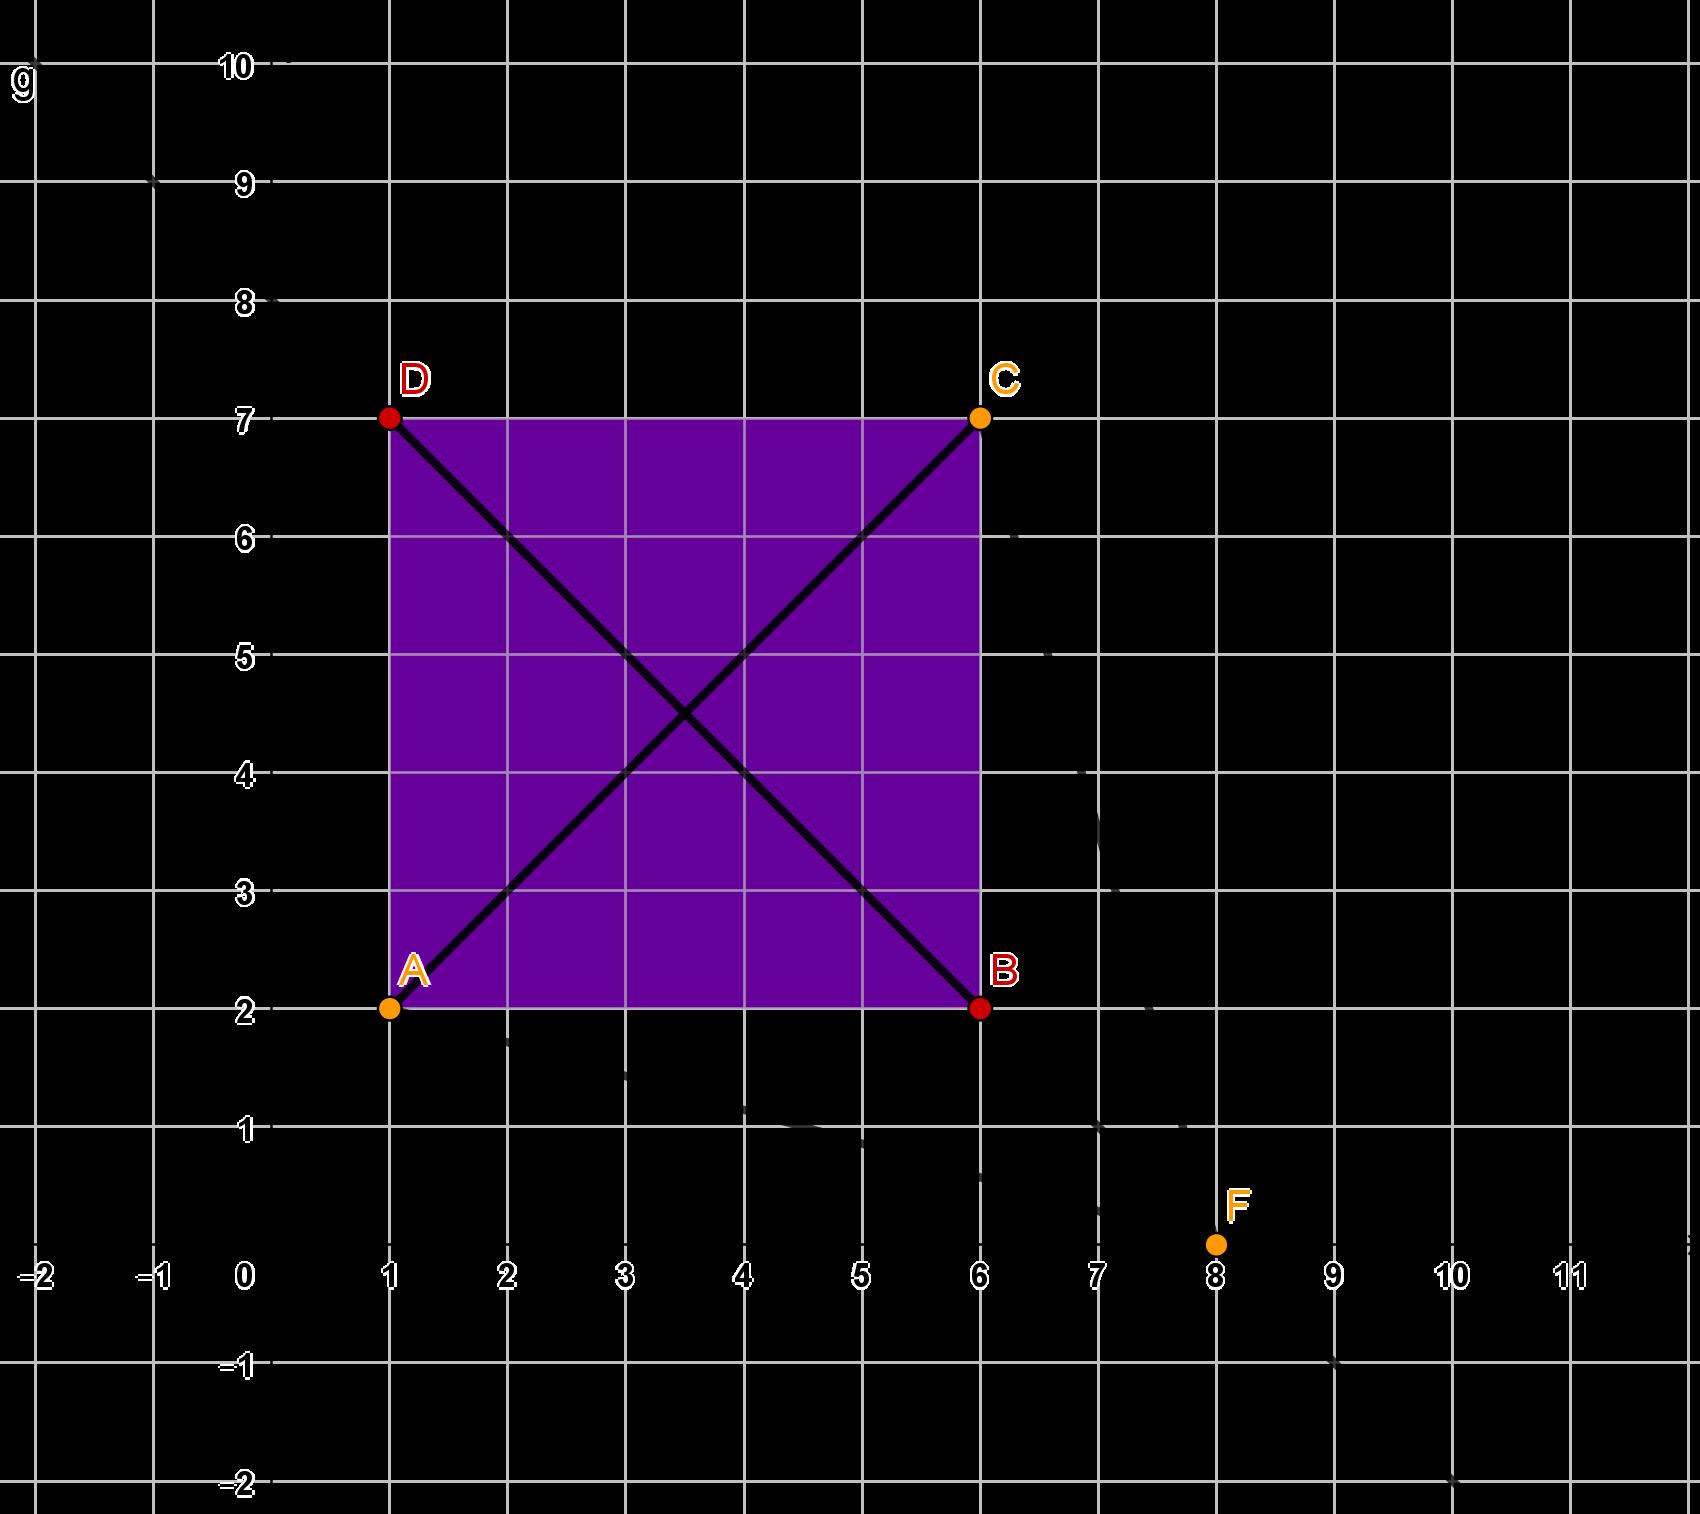 Koordinatensystem mit Quadrat